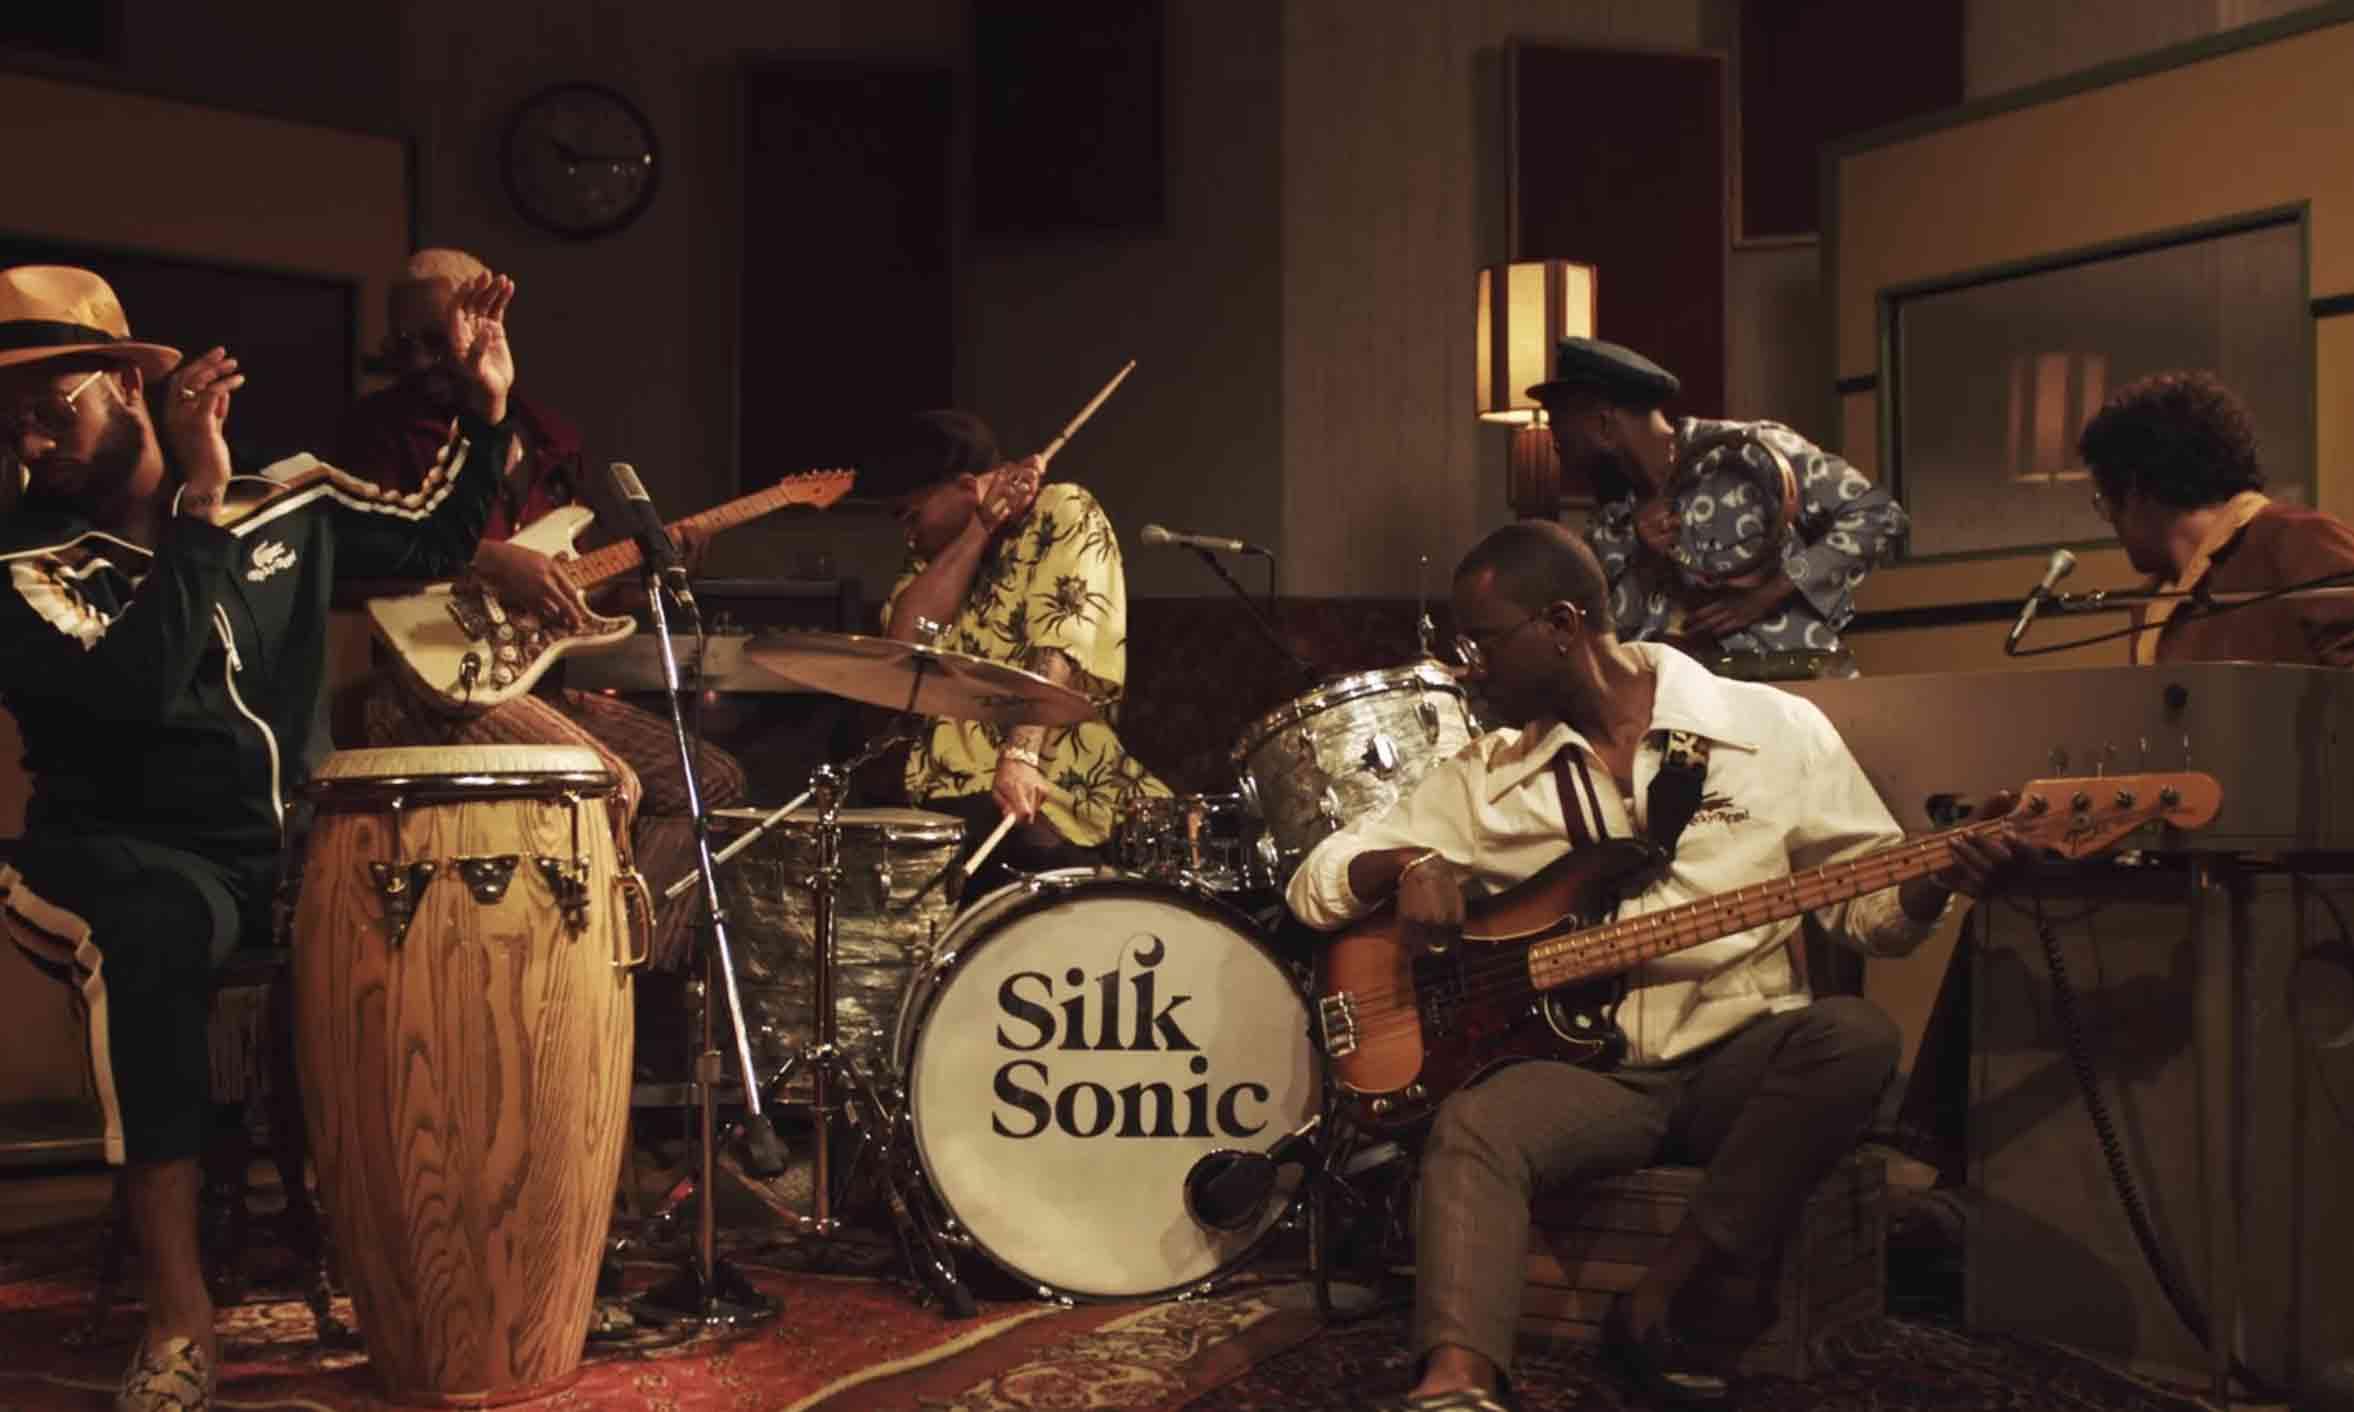 Bruno Mars 联手 Anderson .Paak 全新组合 Silk Sonic 新单《Leave The Door Open》MV 发布